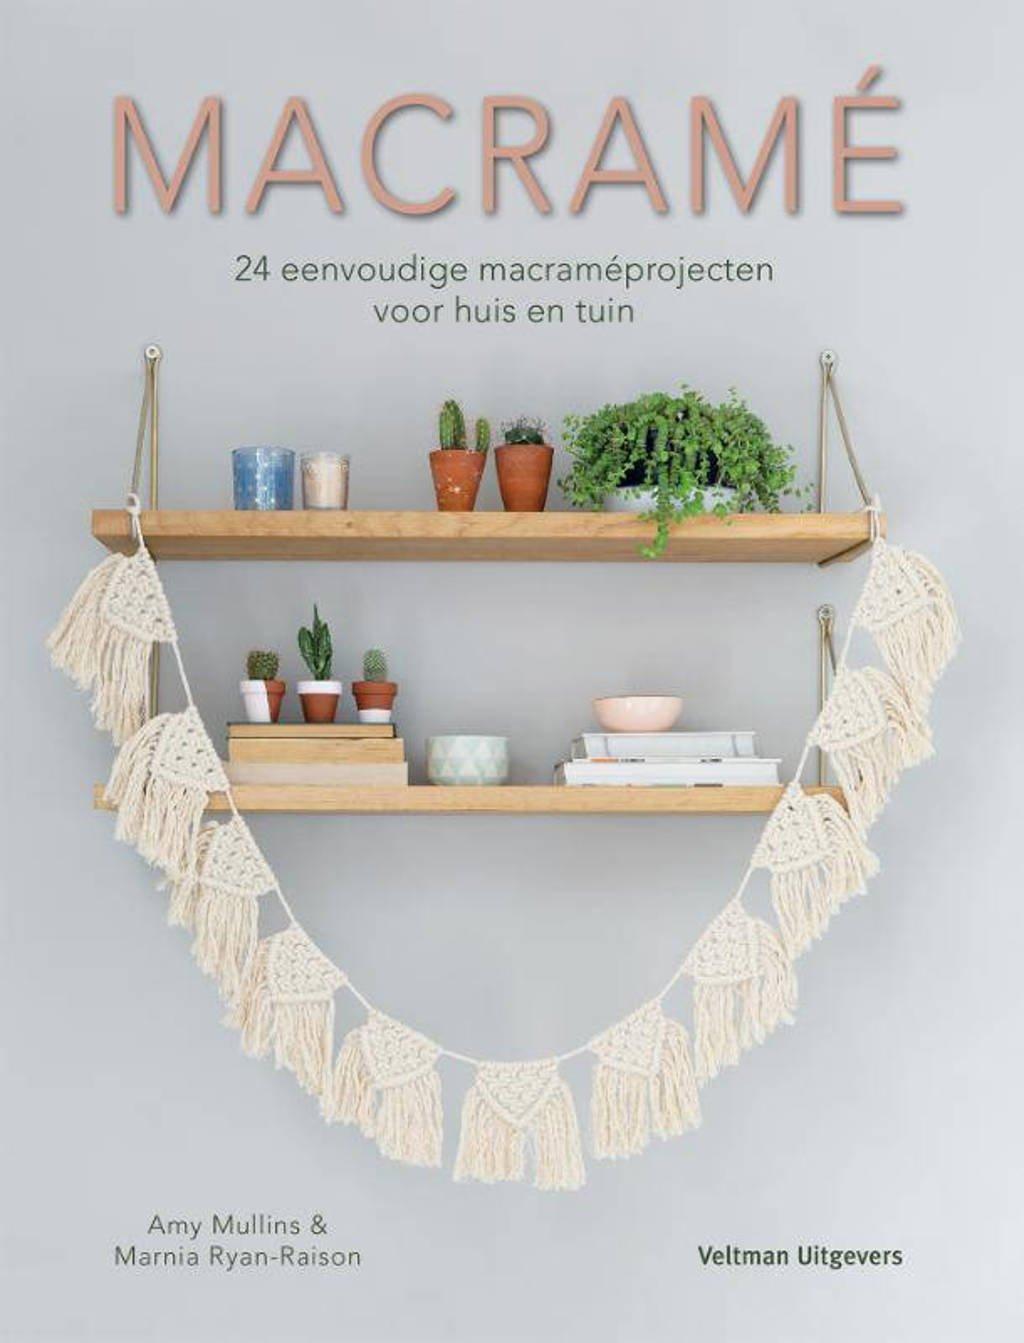 Macramé - Amy Mullins en Marnia Ryan-Raison